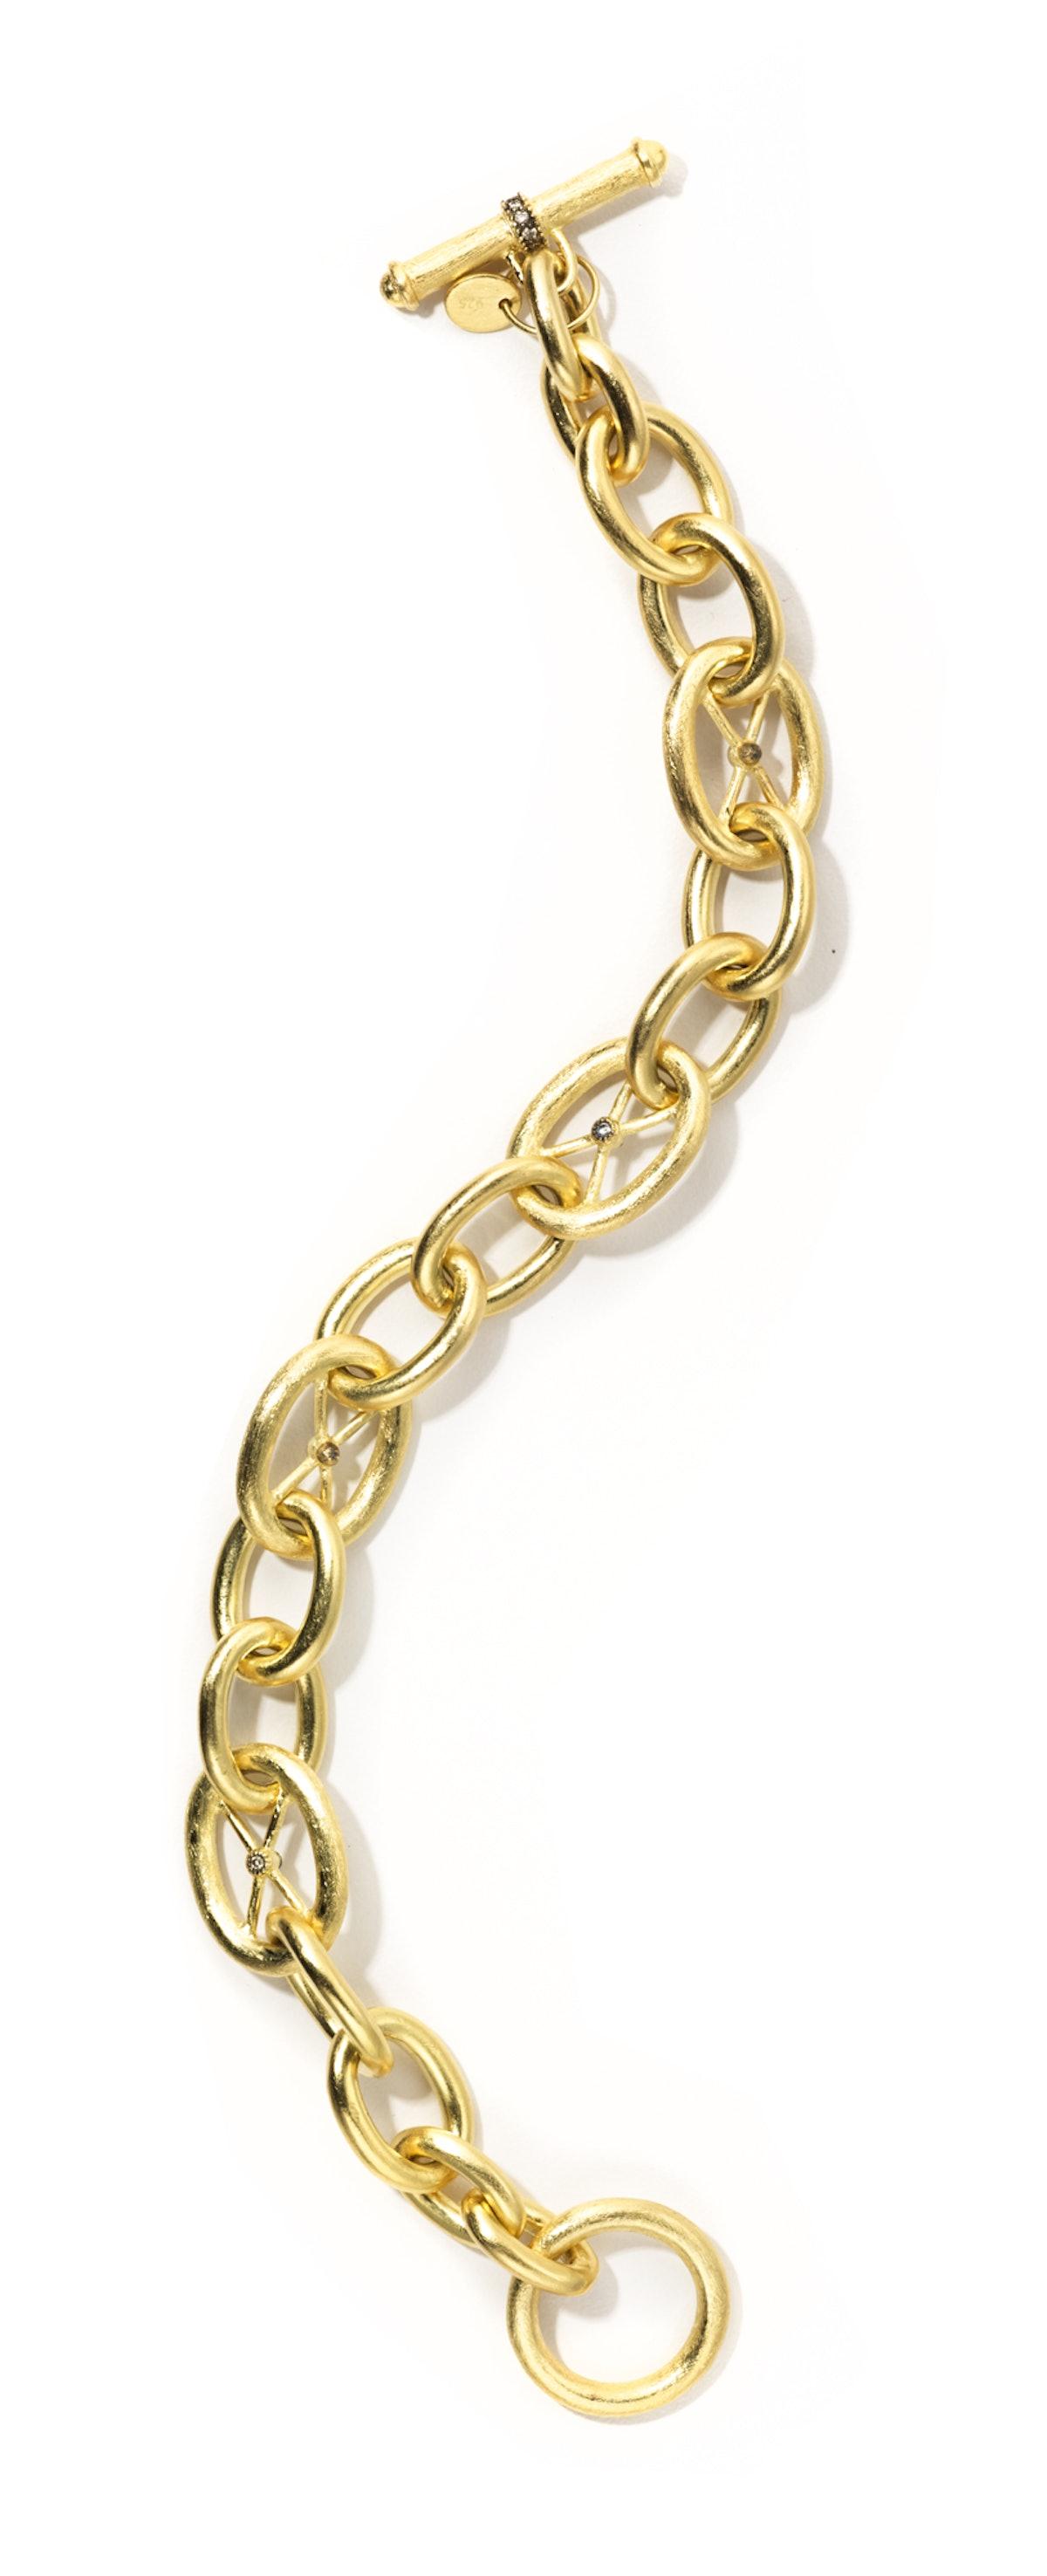 JudeFrances Jewelry gold and diamond bracelet, $3,570, Neiman Marcus, 888.888.4757.